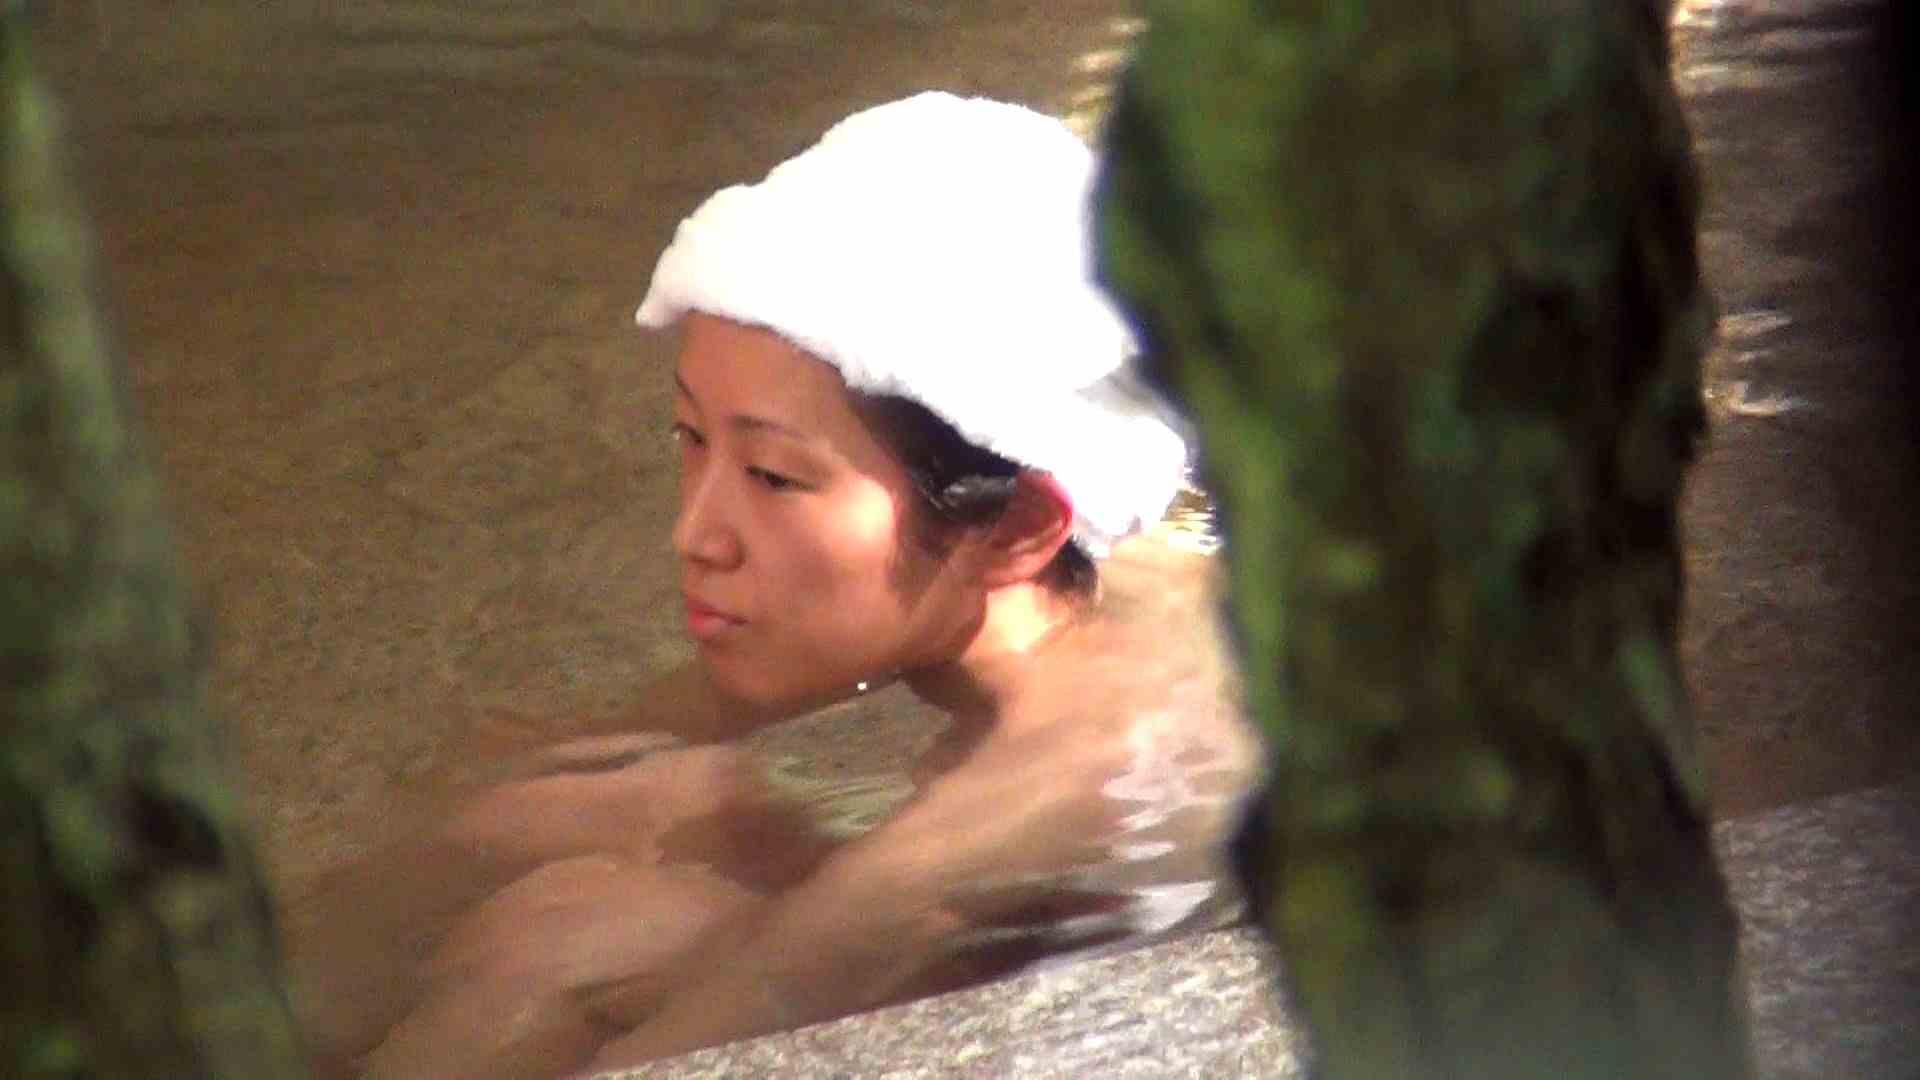 Vol.51 醤油j顔のお女市さん 胸の割りに下半身はがっちりタイプ 露天丸見え | 細身女性  79画像 66